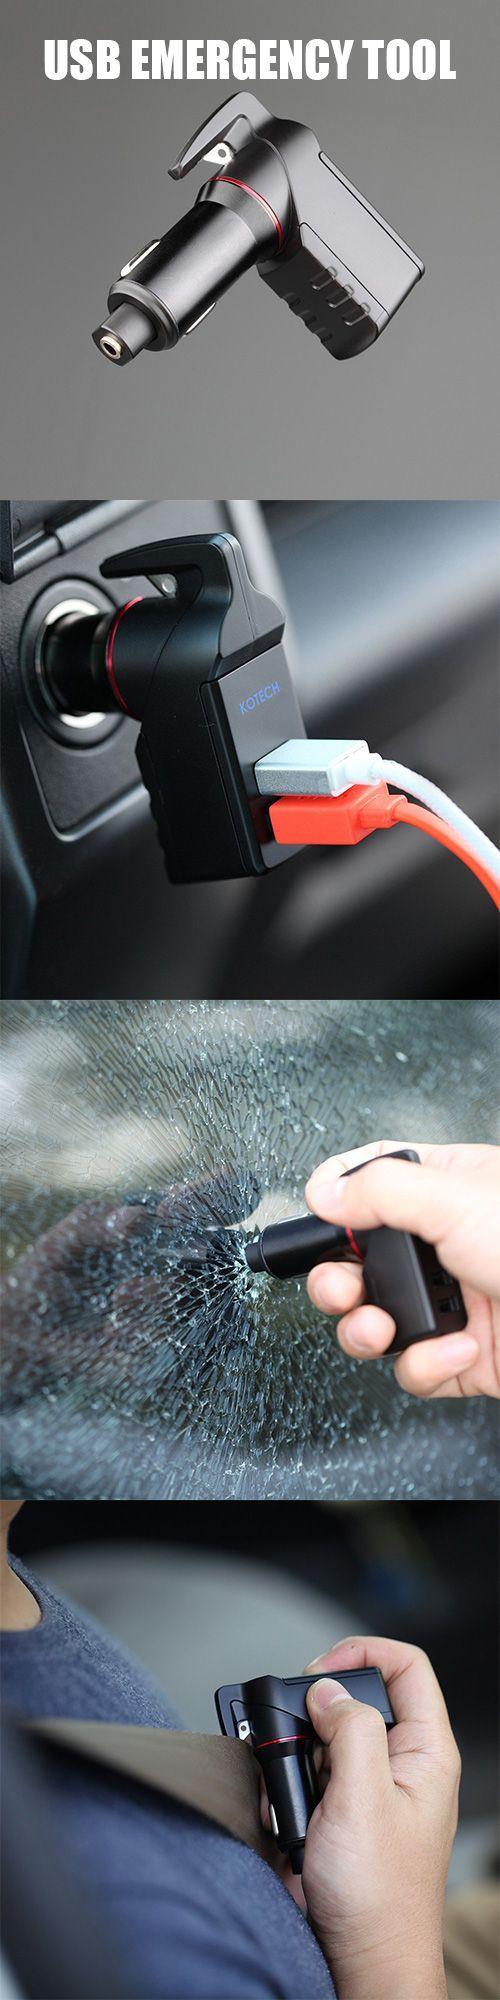 STINGER USB EMERGENCY TOOL Cool gadgets survival gadget